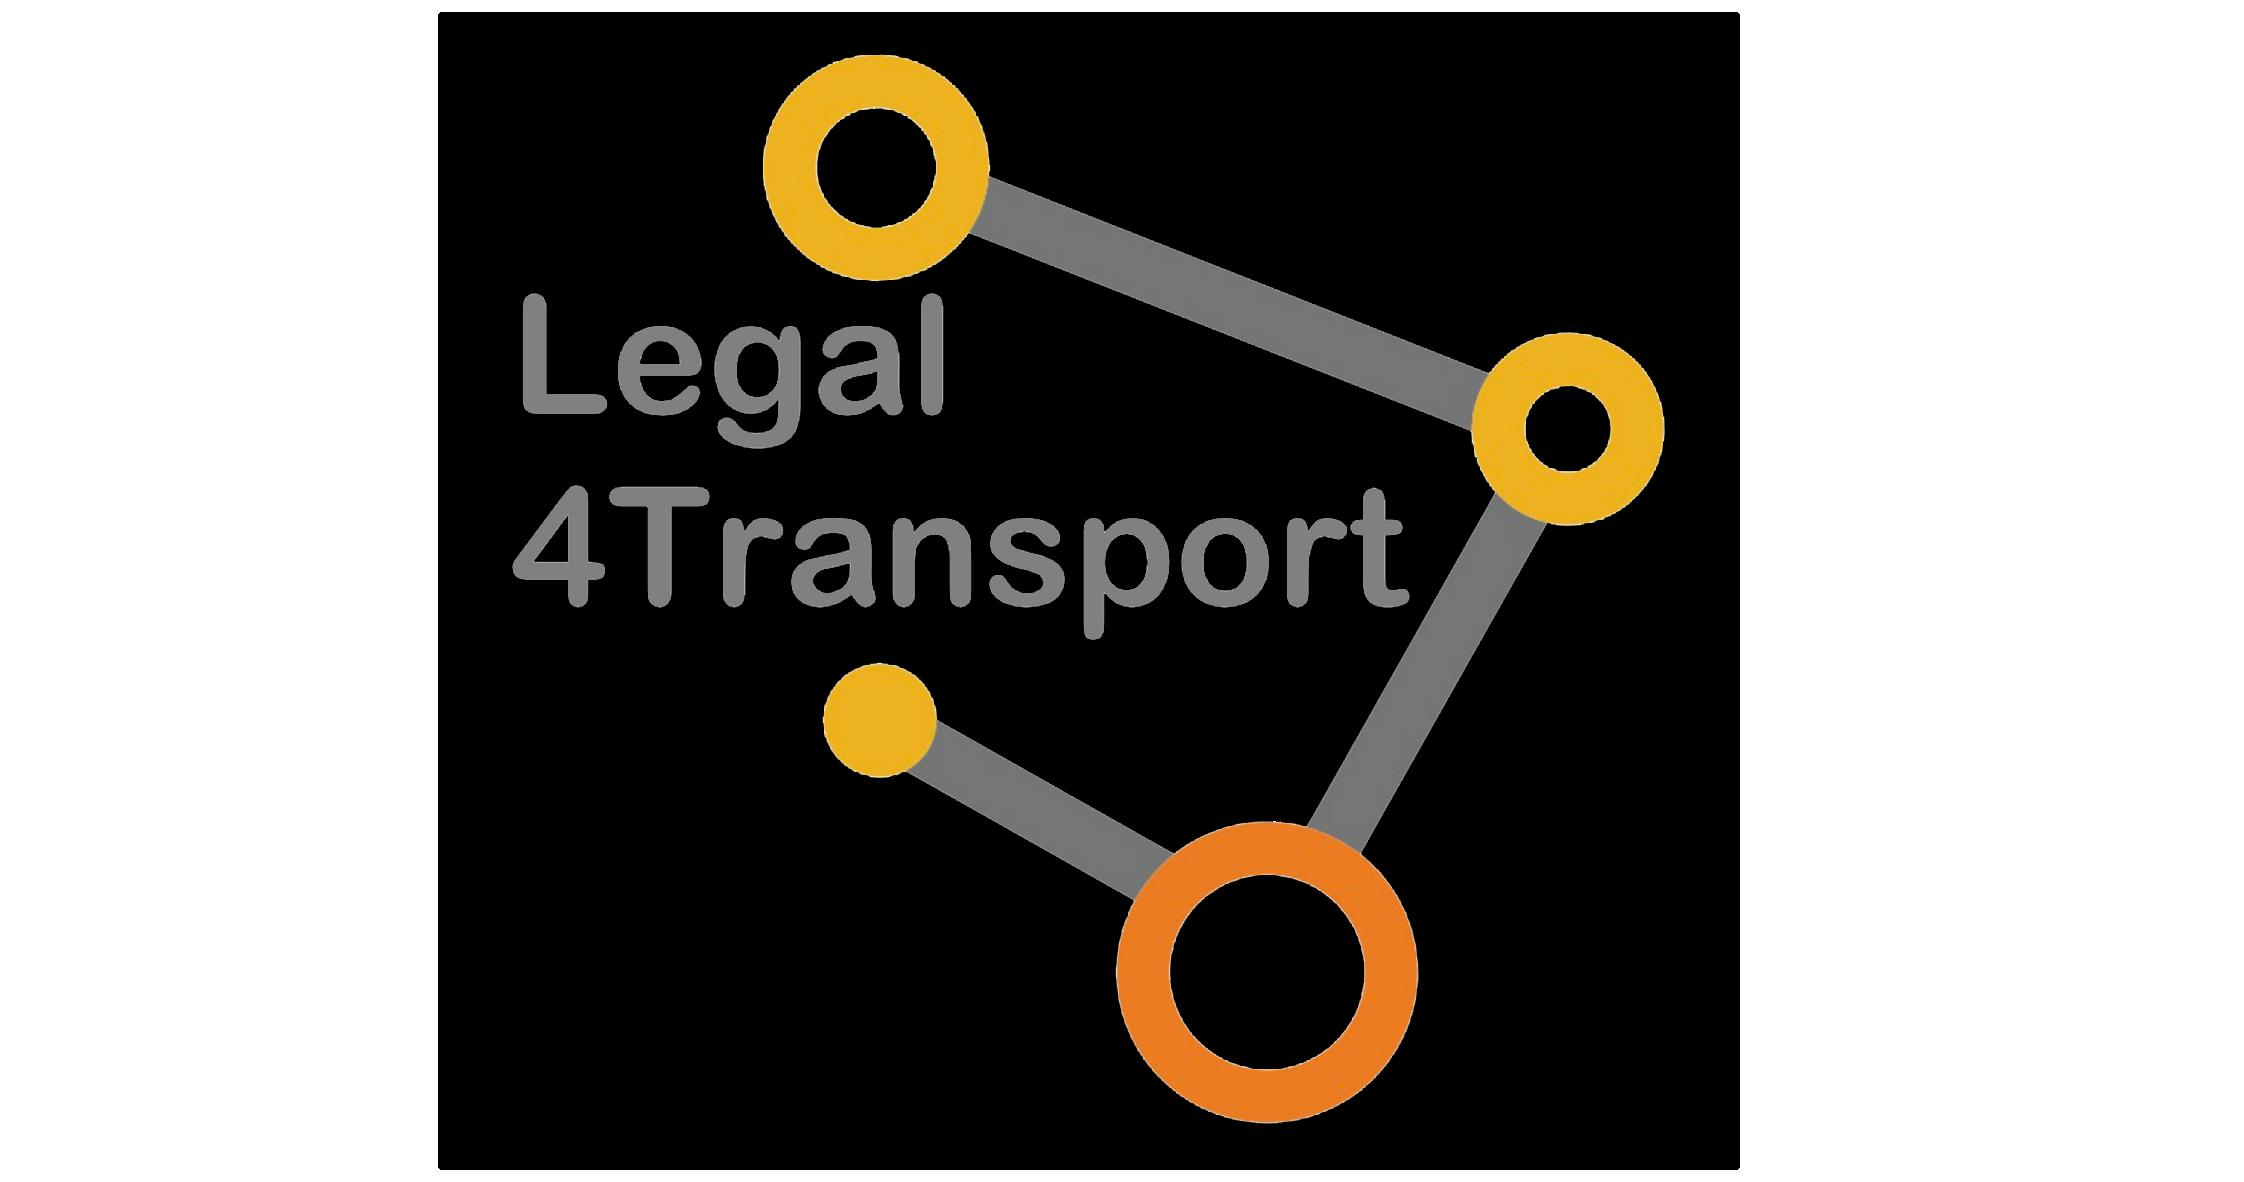 Legal 4Transport